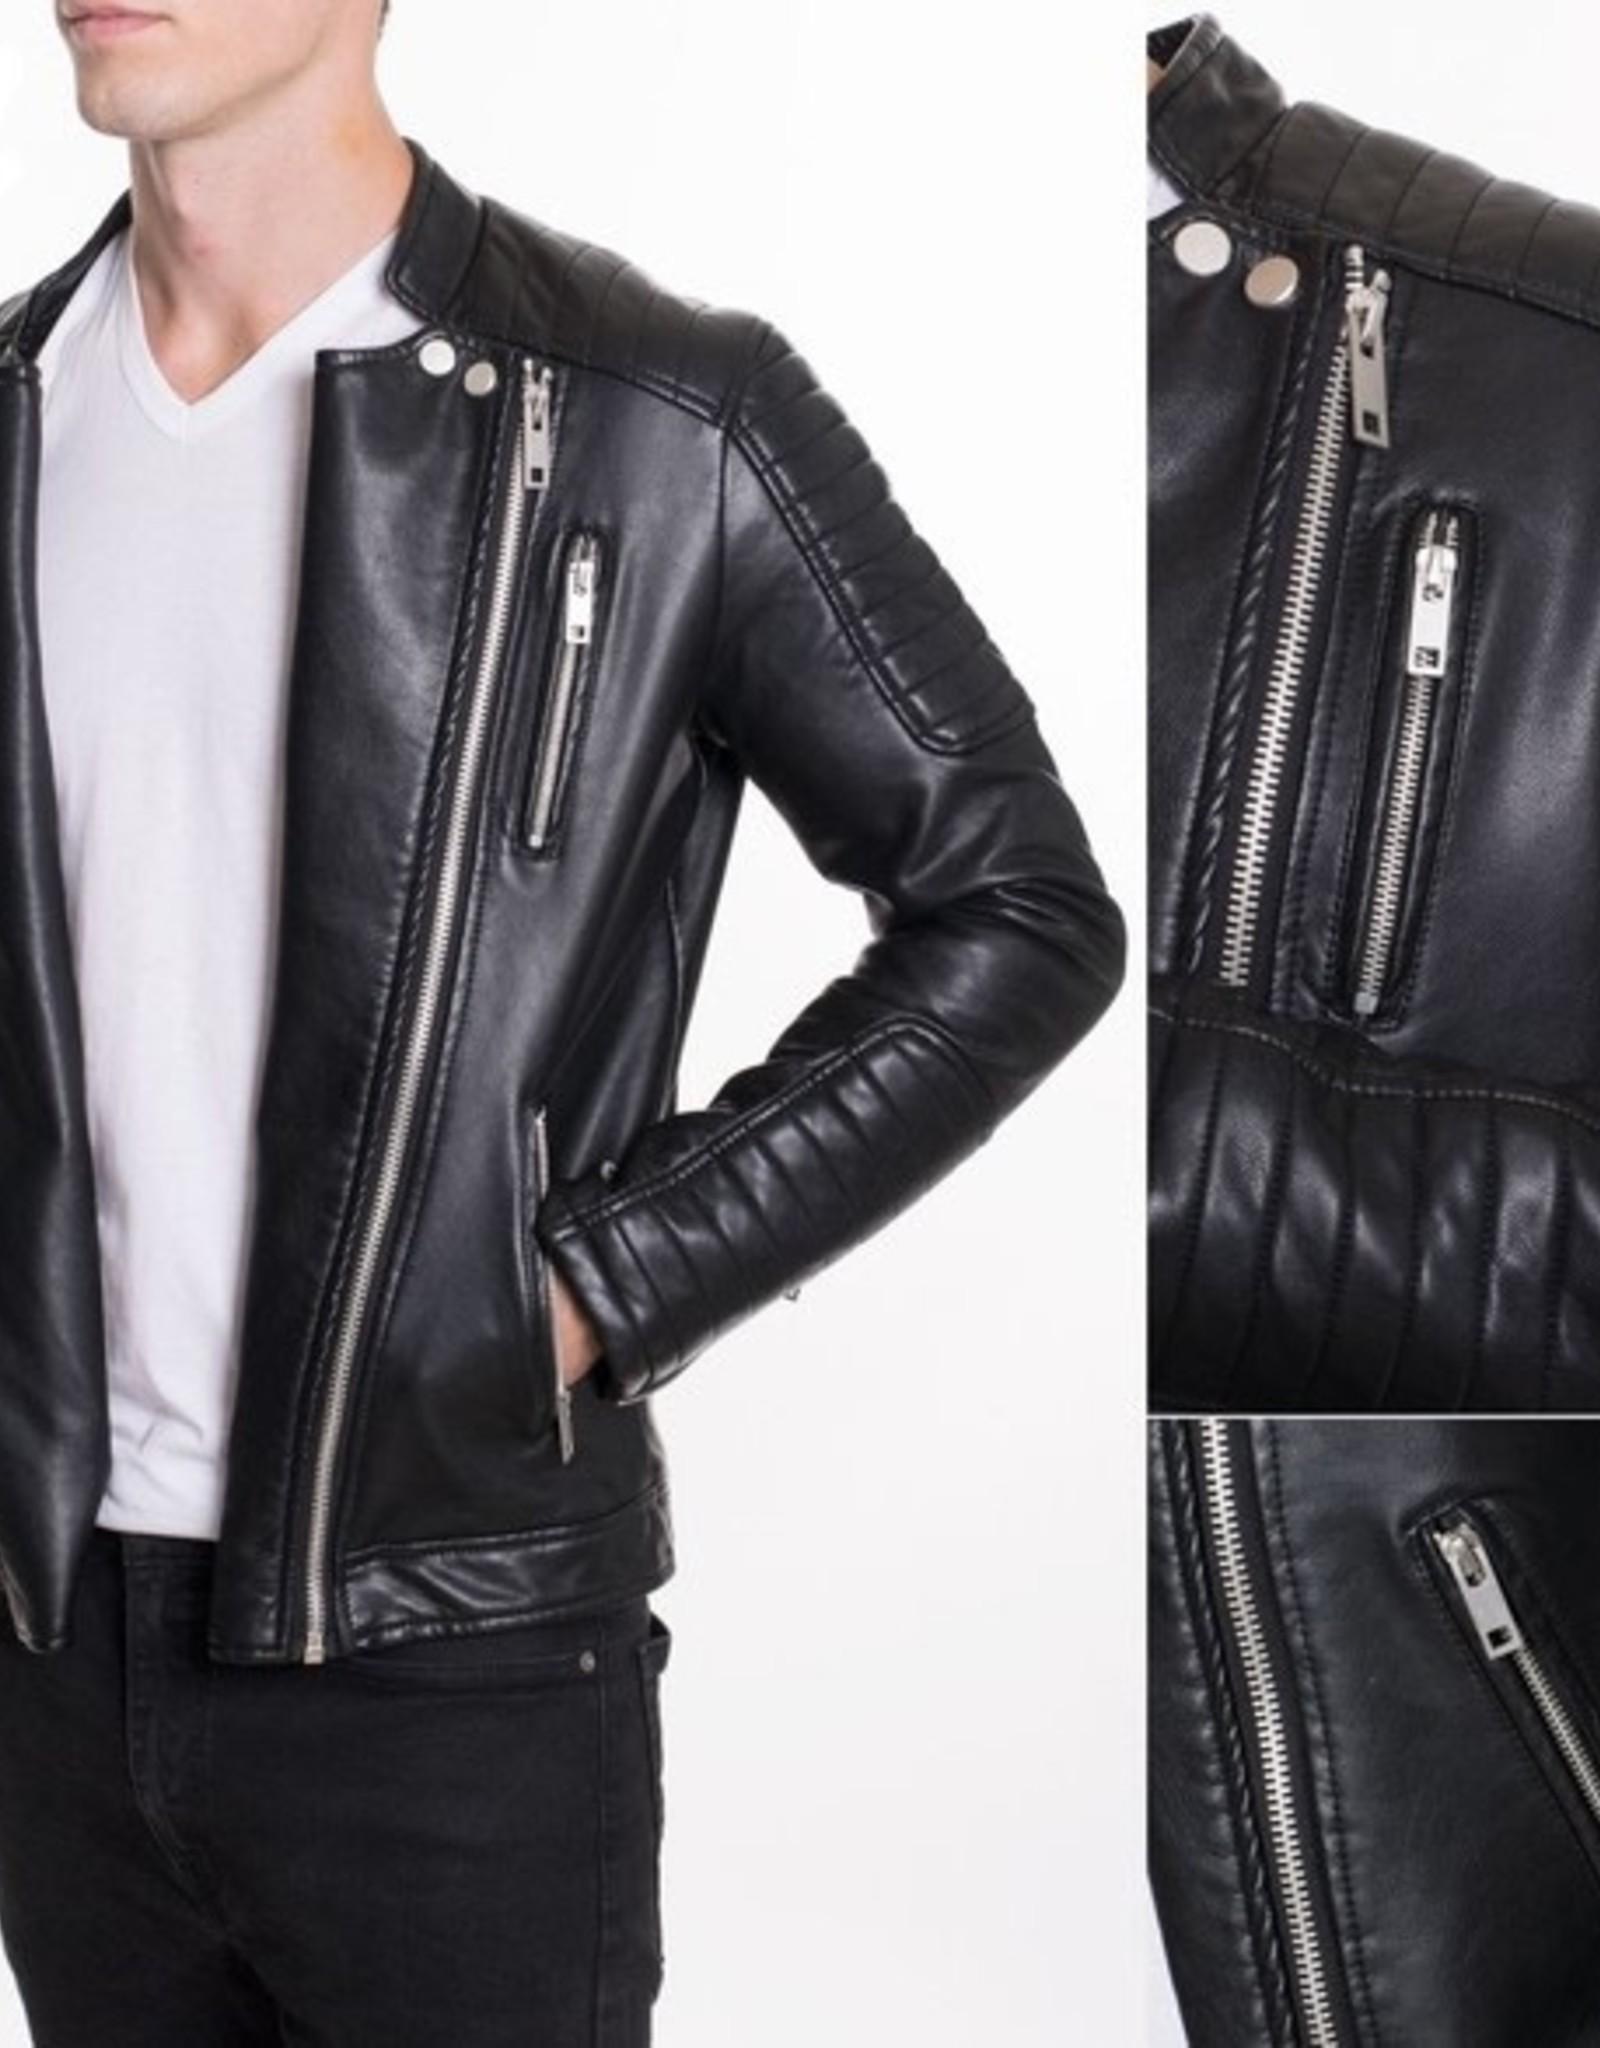 Urban Fitz Urban Fitz VFP-05 Black Jacket